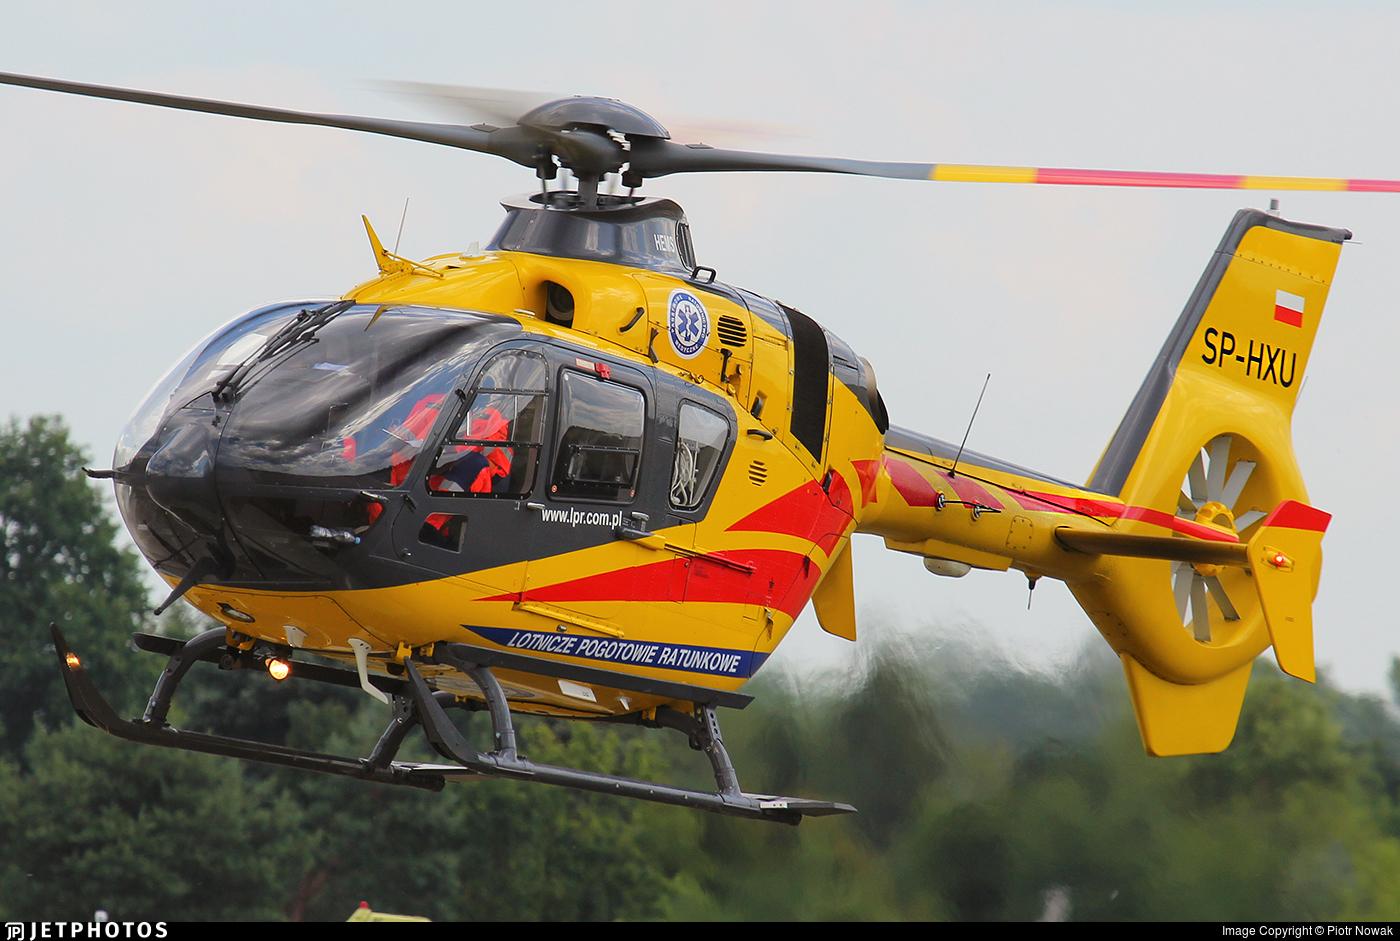 SP-HXU - Eurocopter EC 135P2+ - Lotnicze Pogotowie Ratunkowe